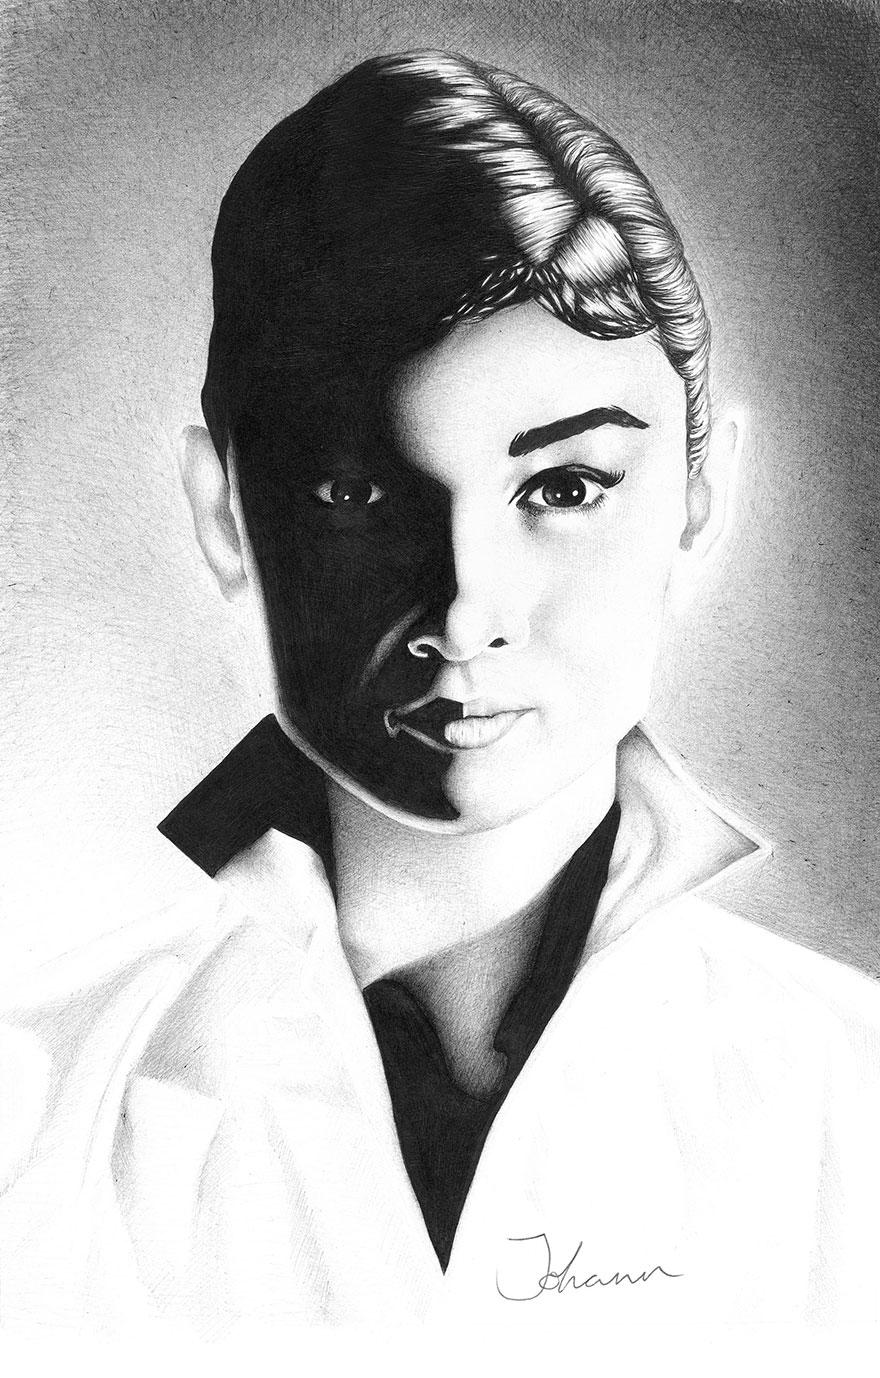 black-ball-point-pen-realistic-drawings-johann-lester-3